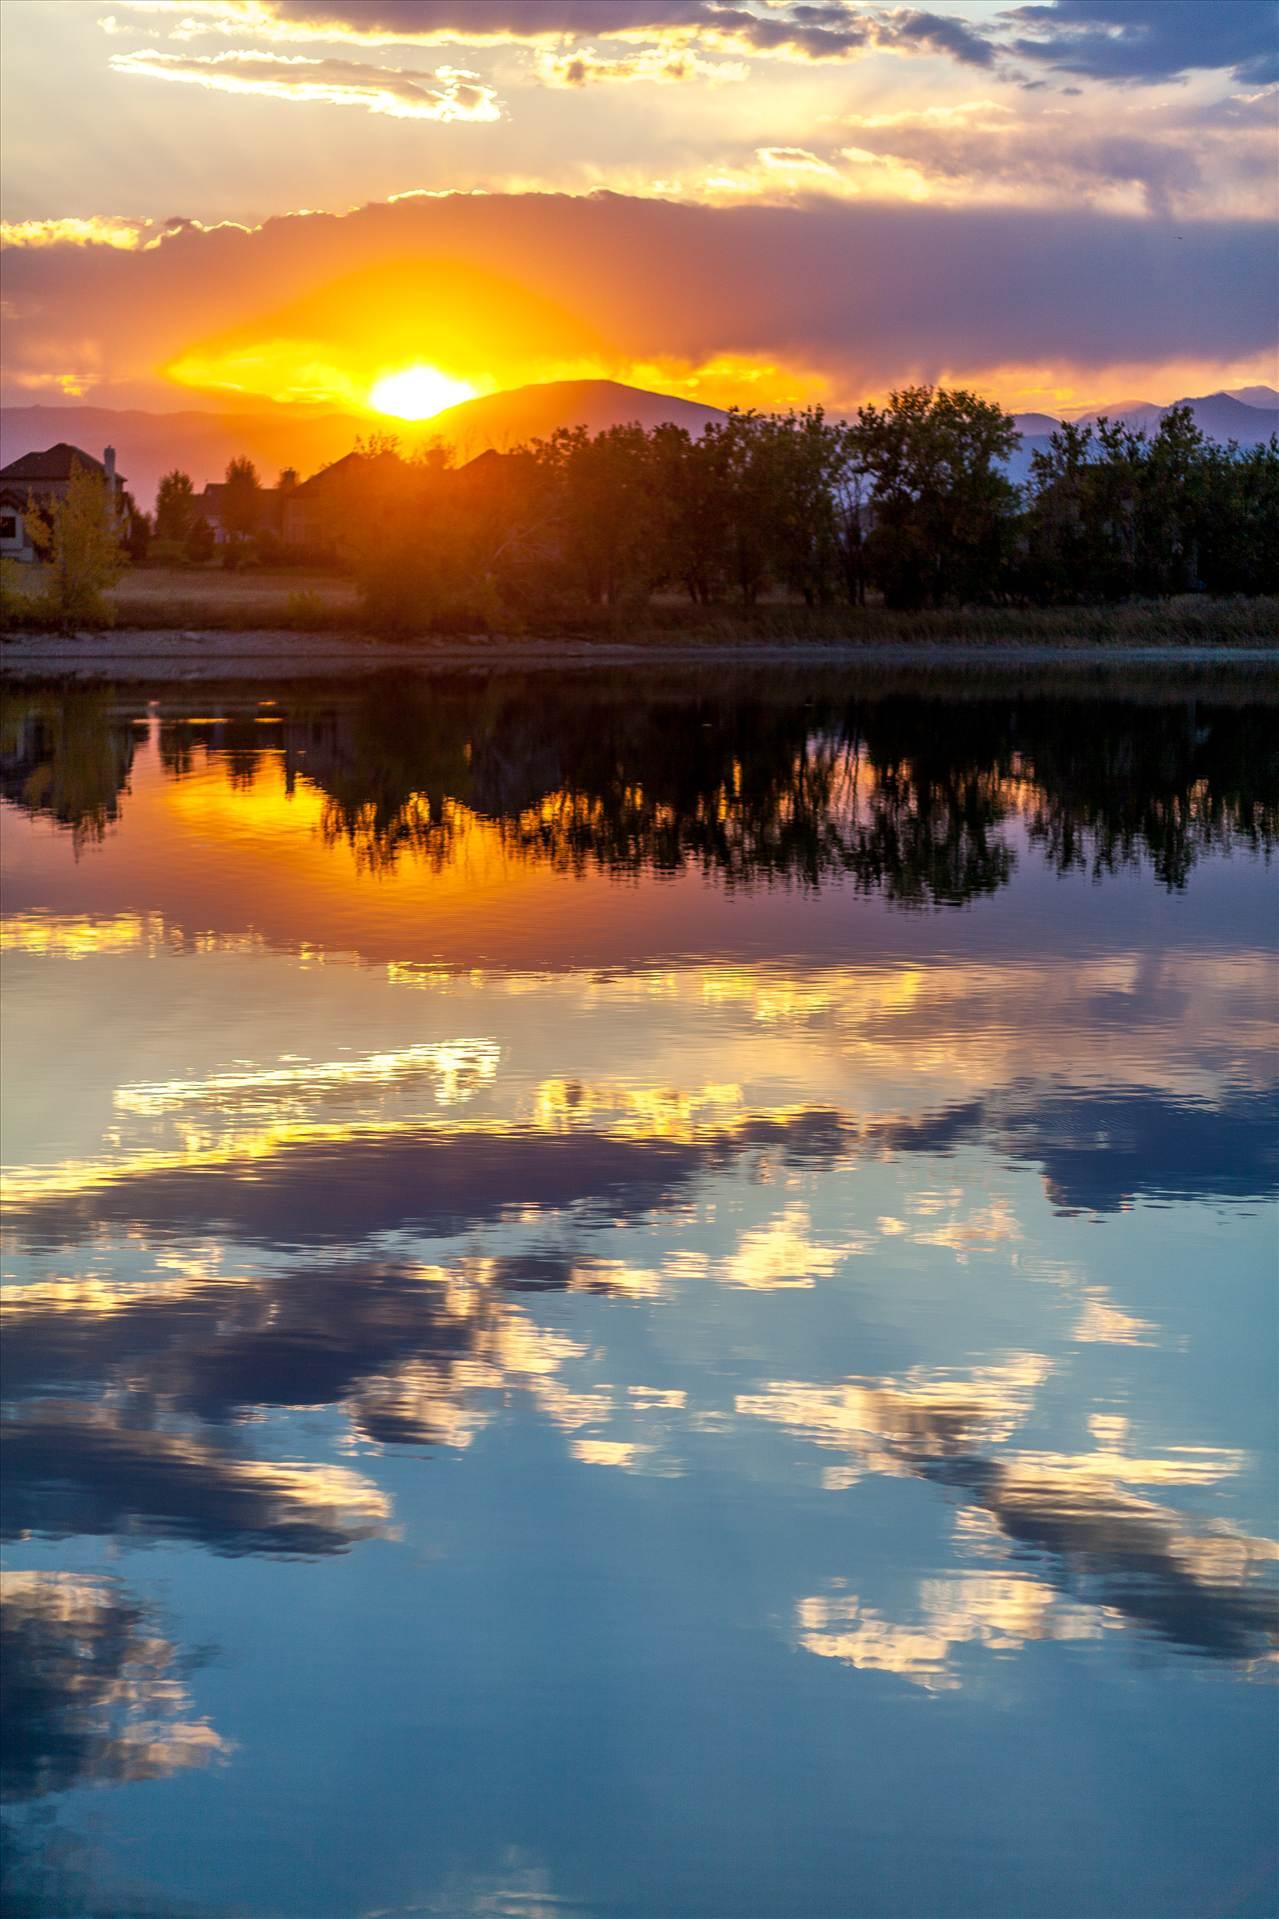 Loveland Sunset I -  by D Scott Smith